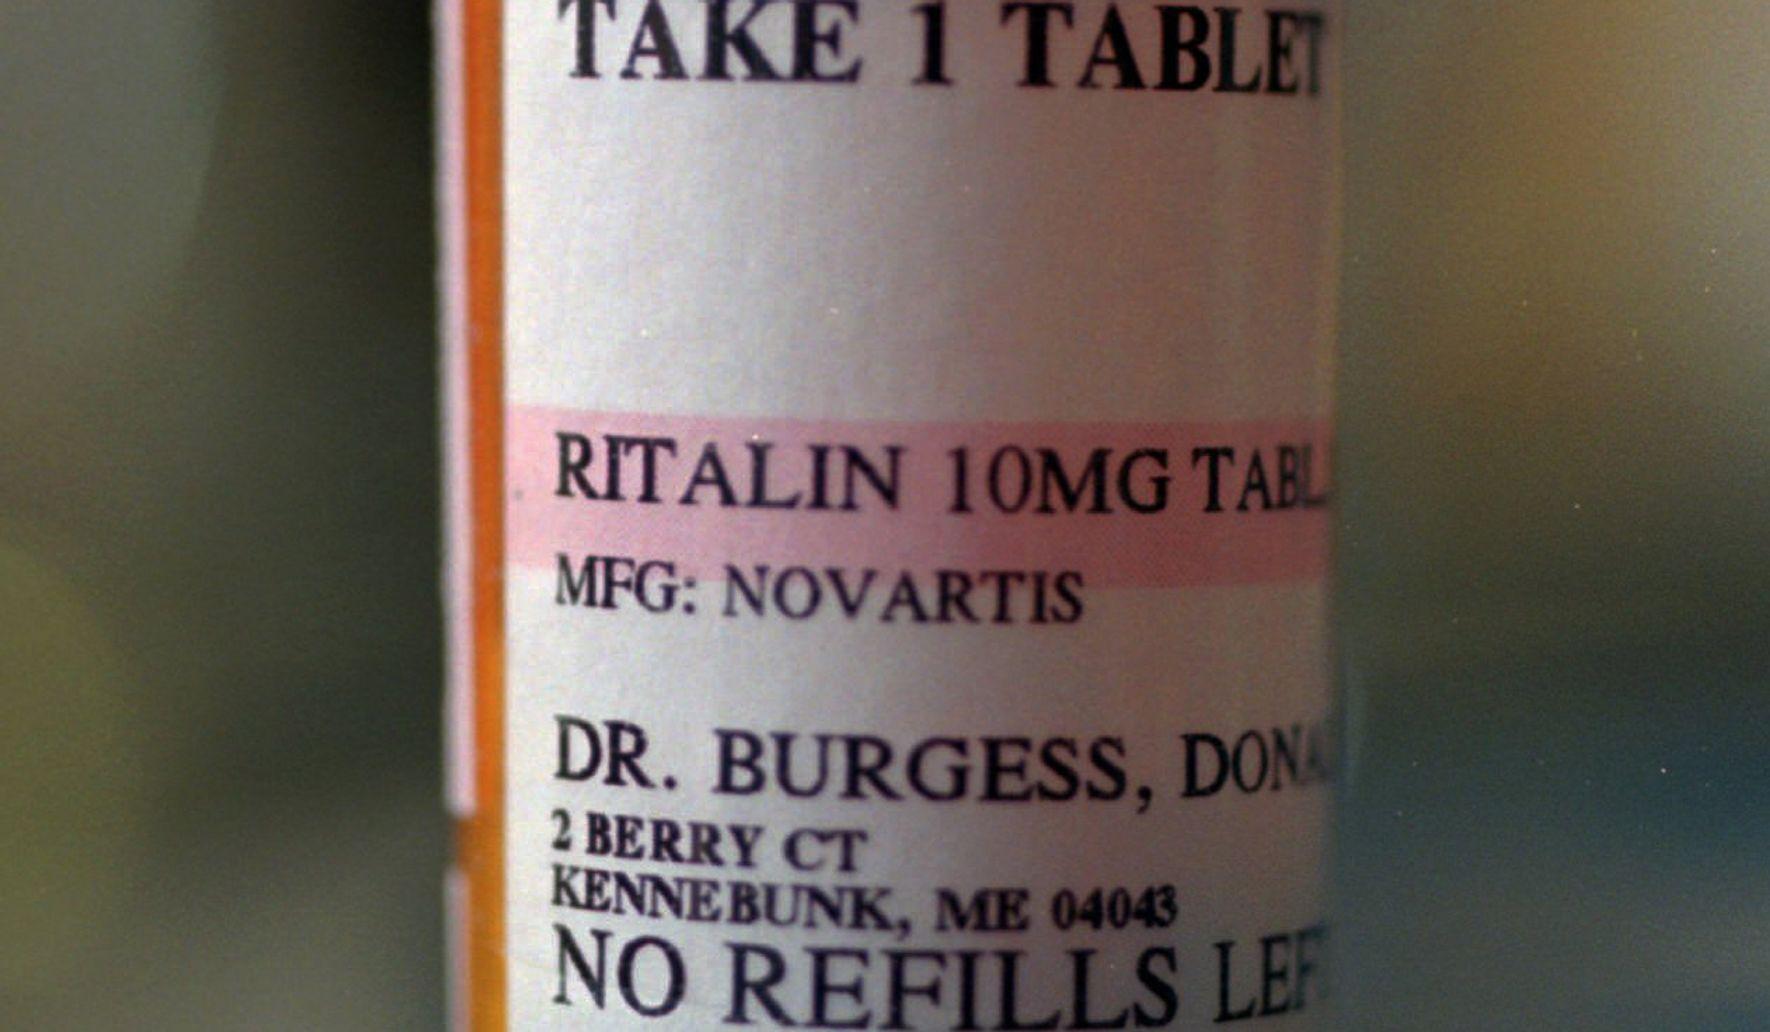 16 million U S  adults on prescription stimulants: Study